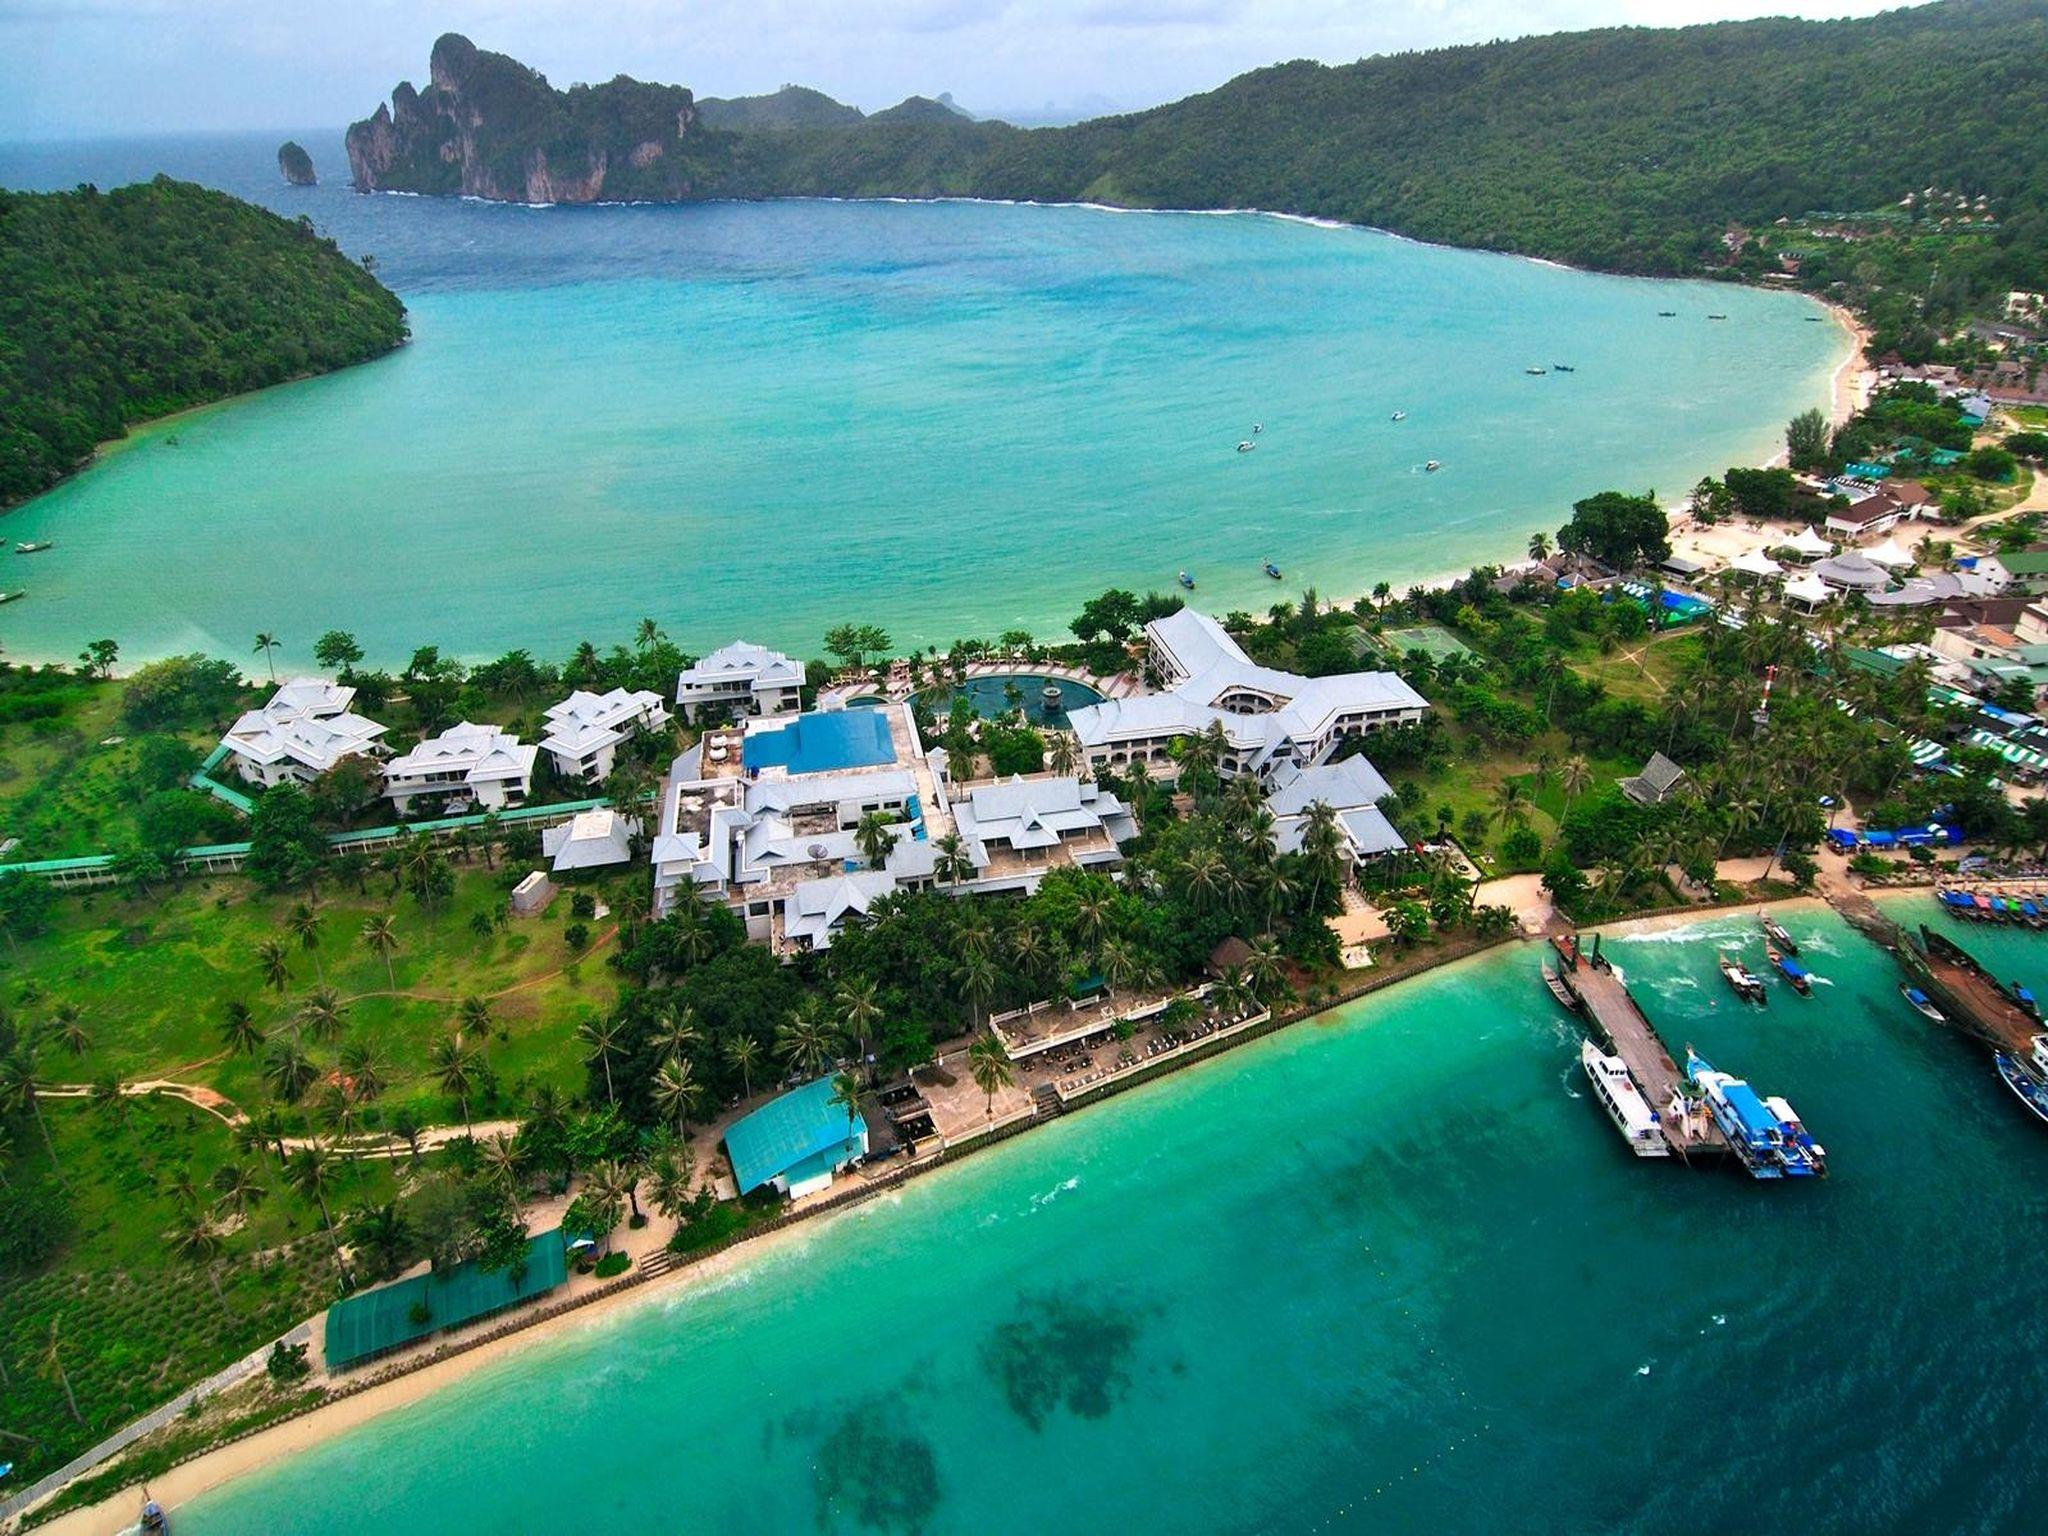 Phi Phi Island Cabana Hotel 皮皮岛卡巴娜酒店